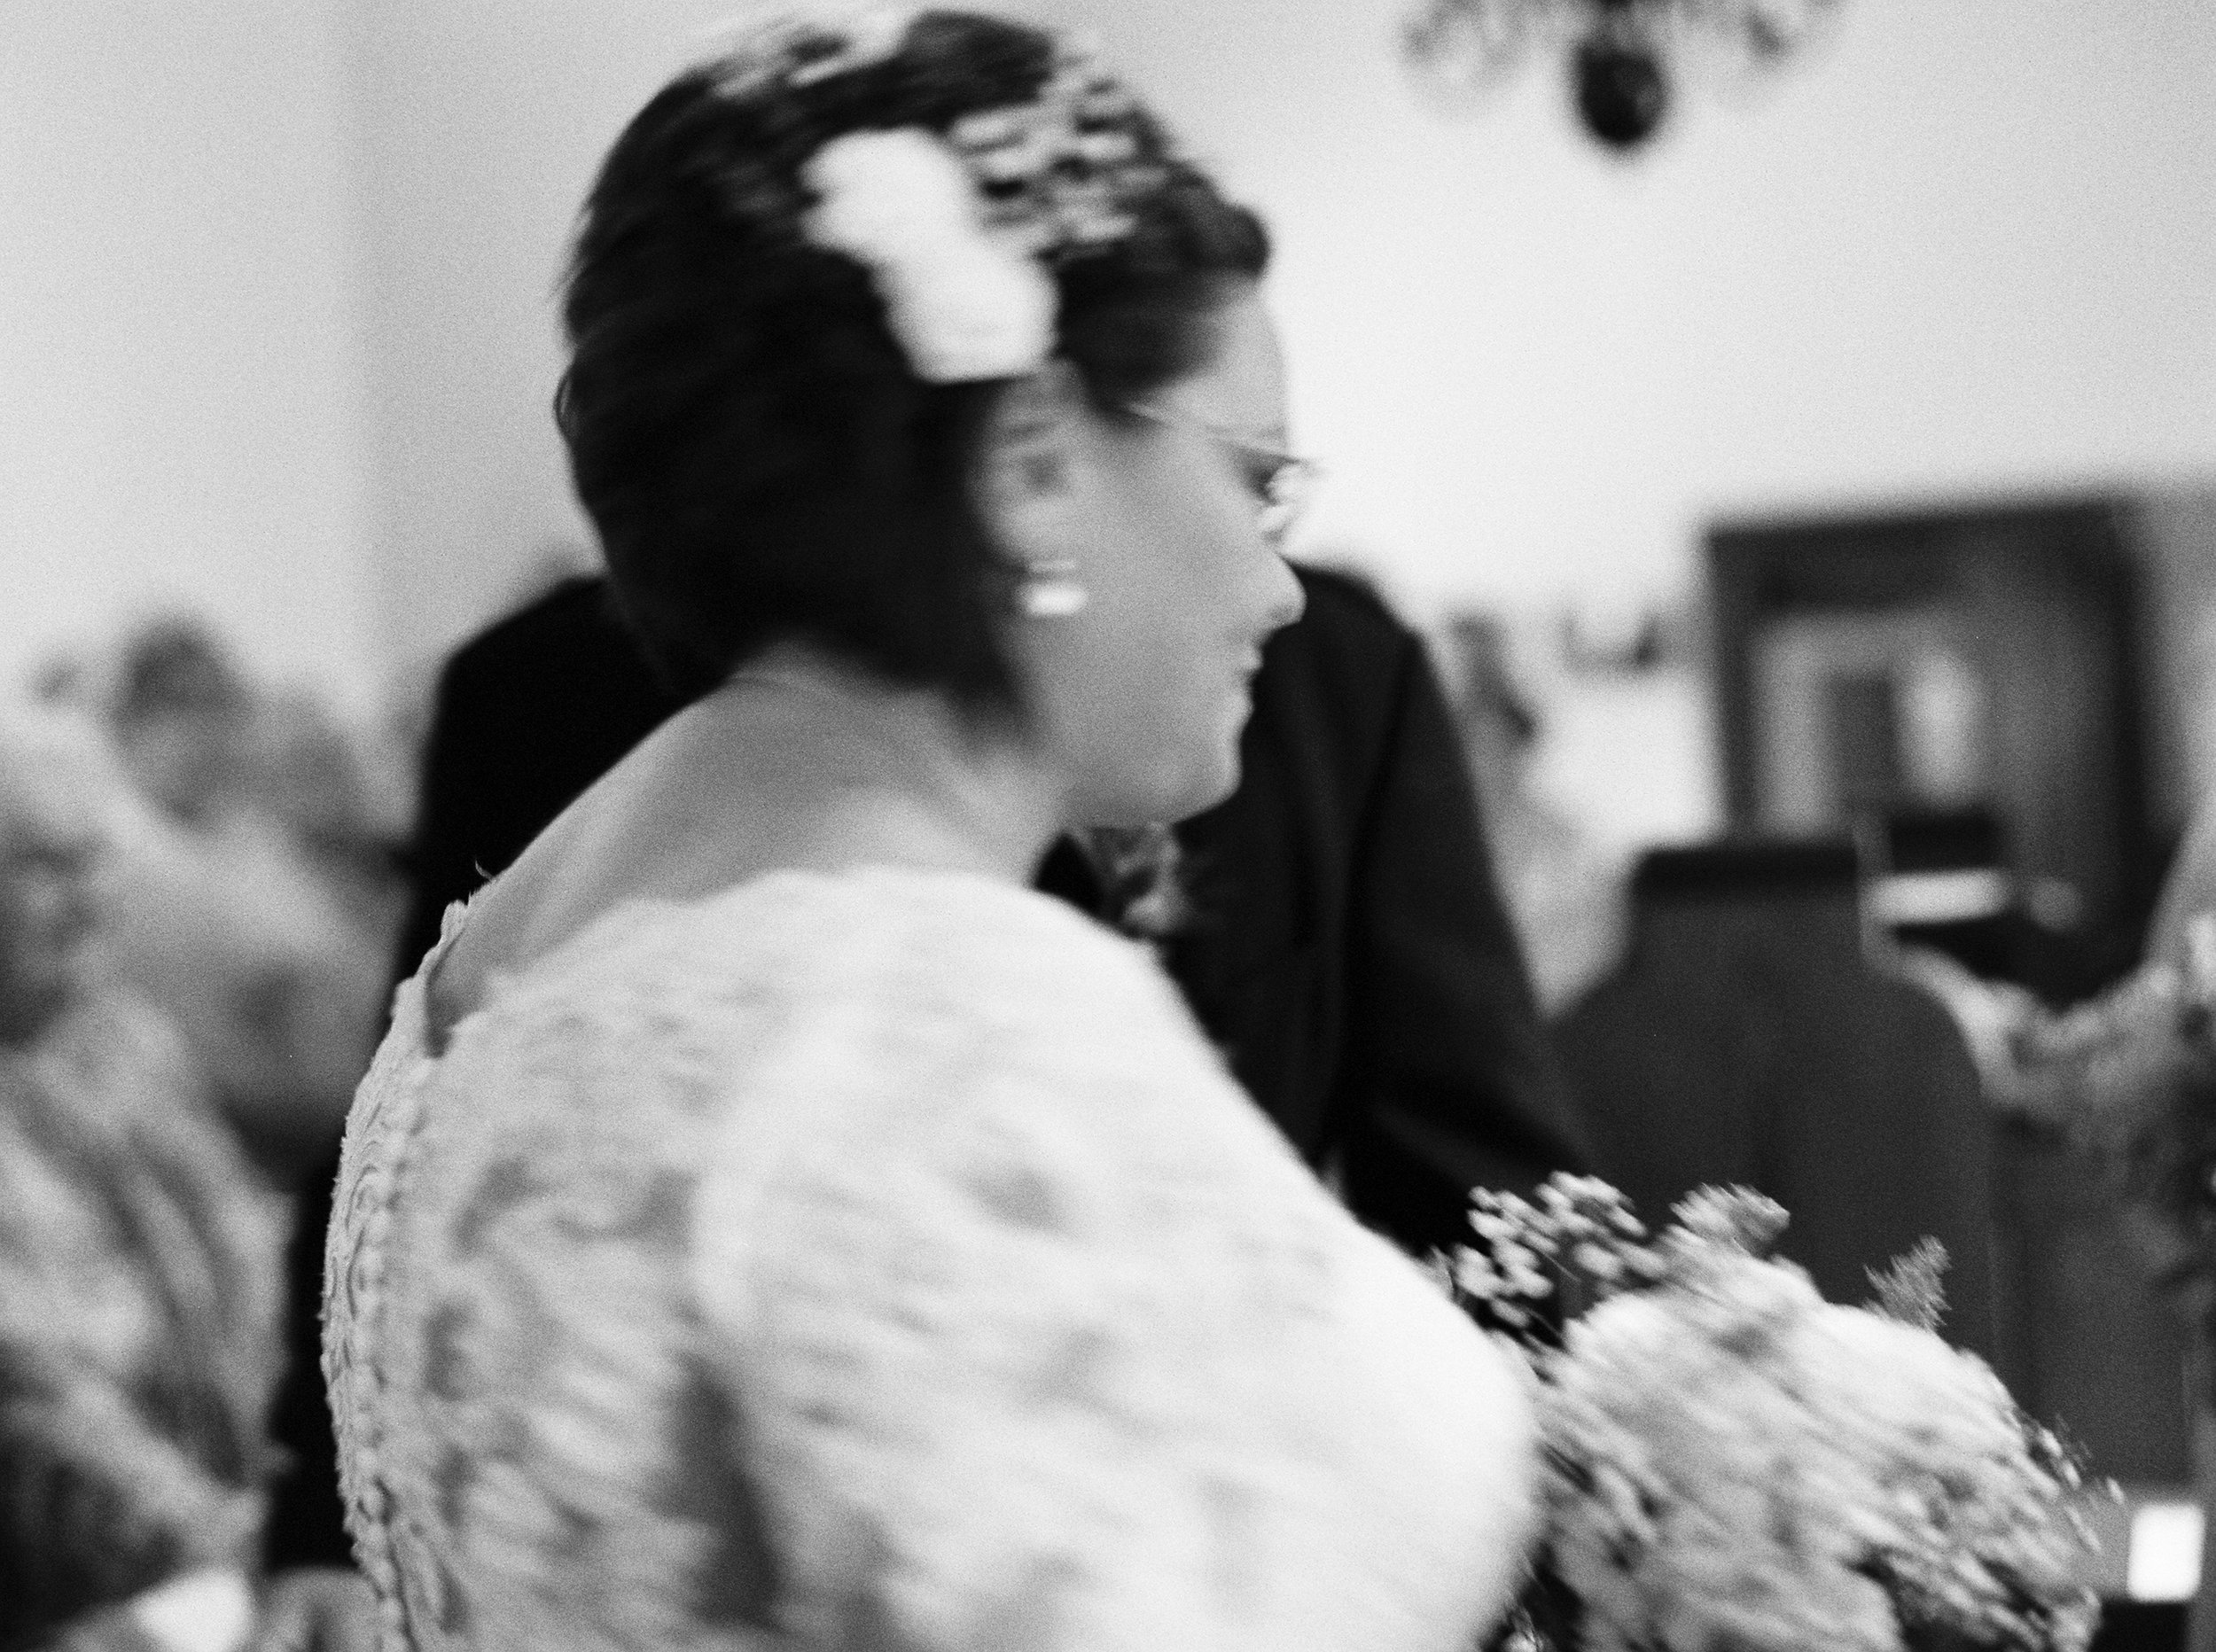 wedding-photography-scotland178.jpg